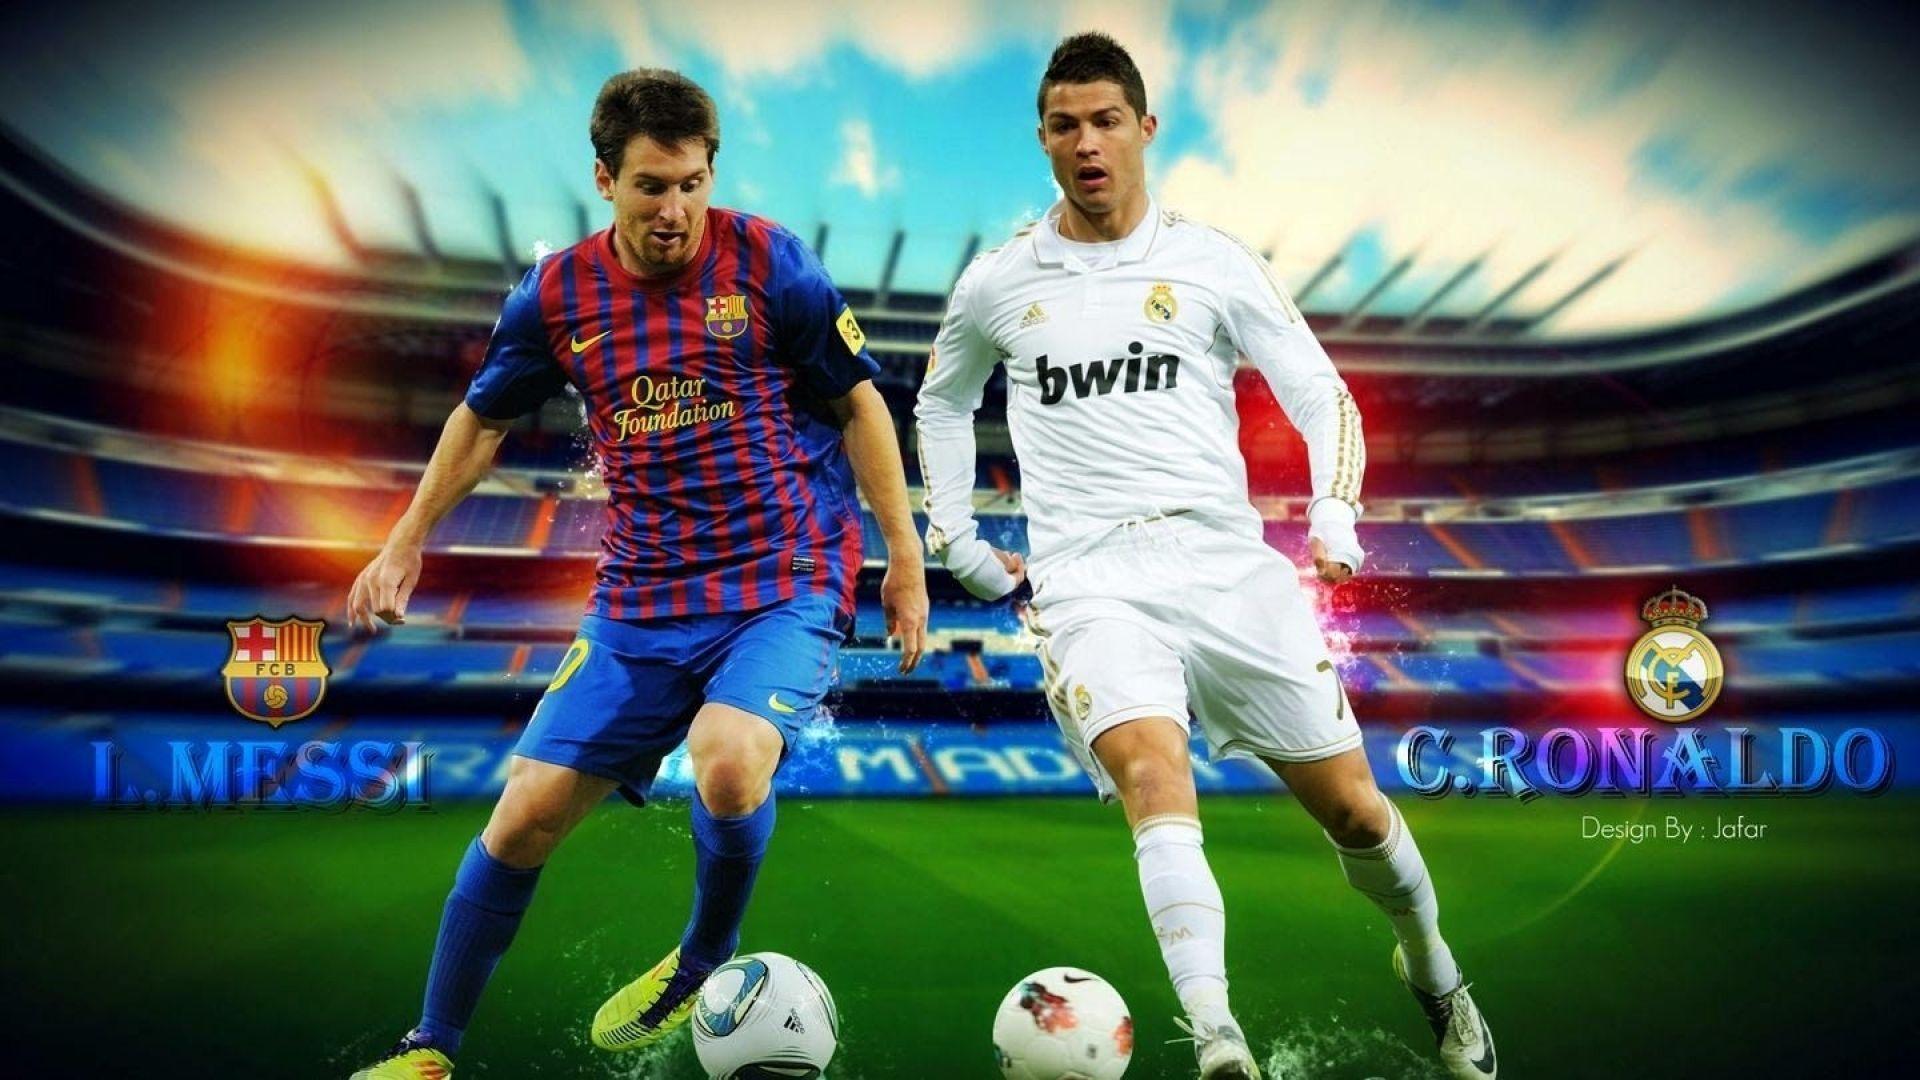 Messi And Ronaldo Wallpapers Top Free Messi And Ronaldo